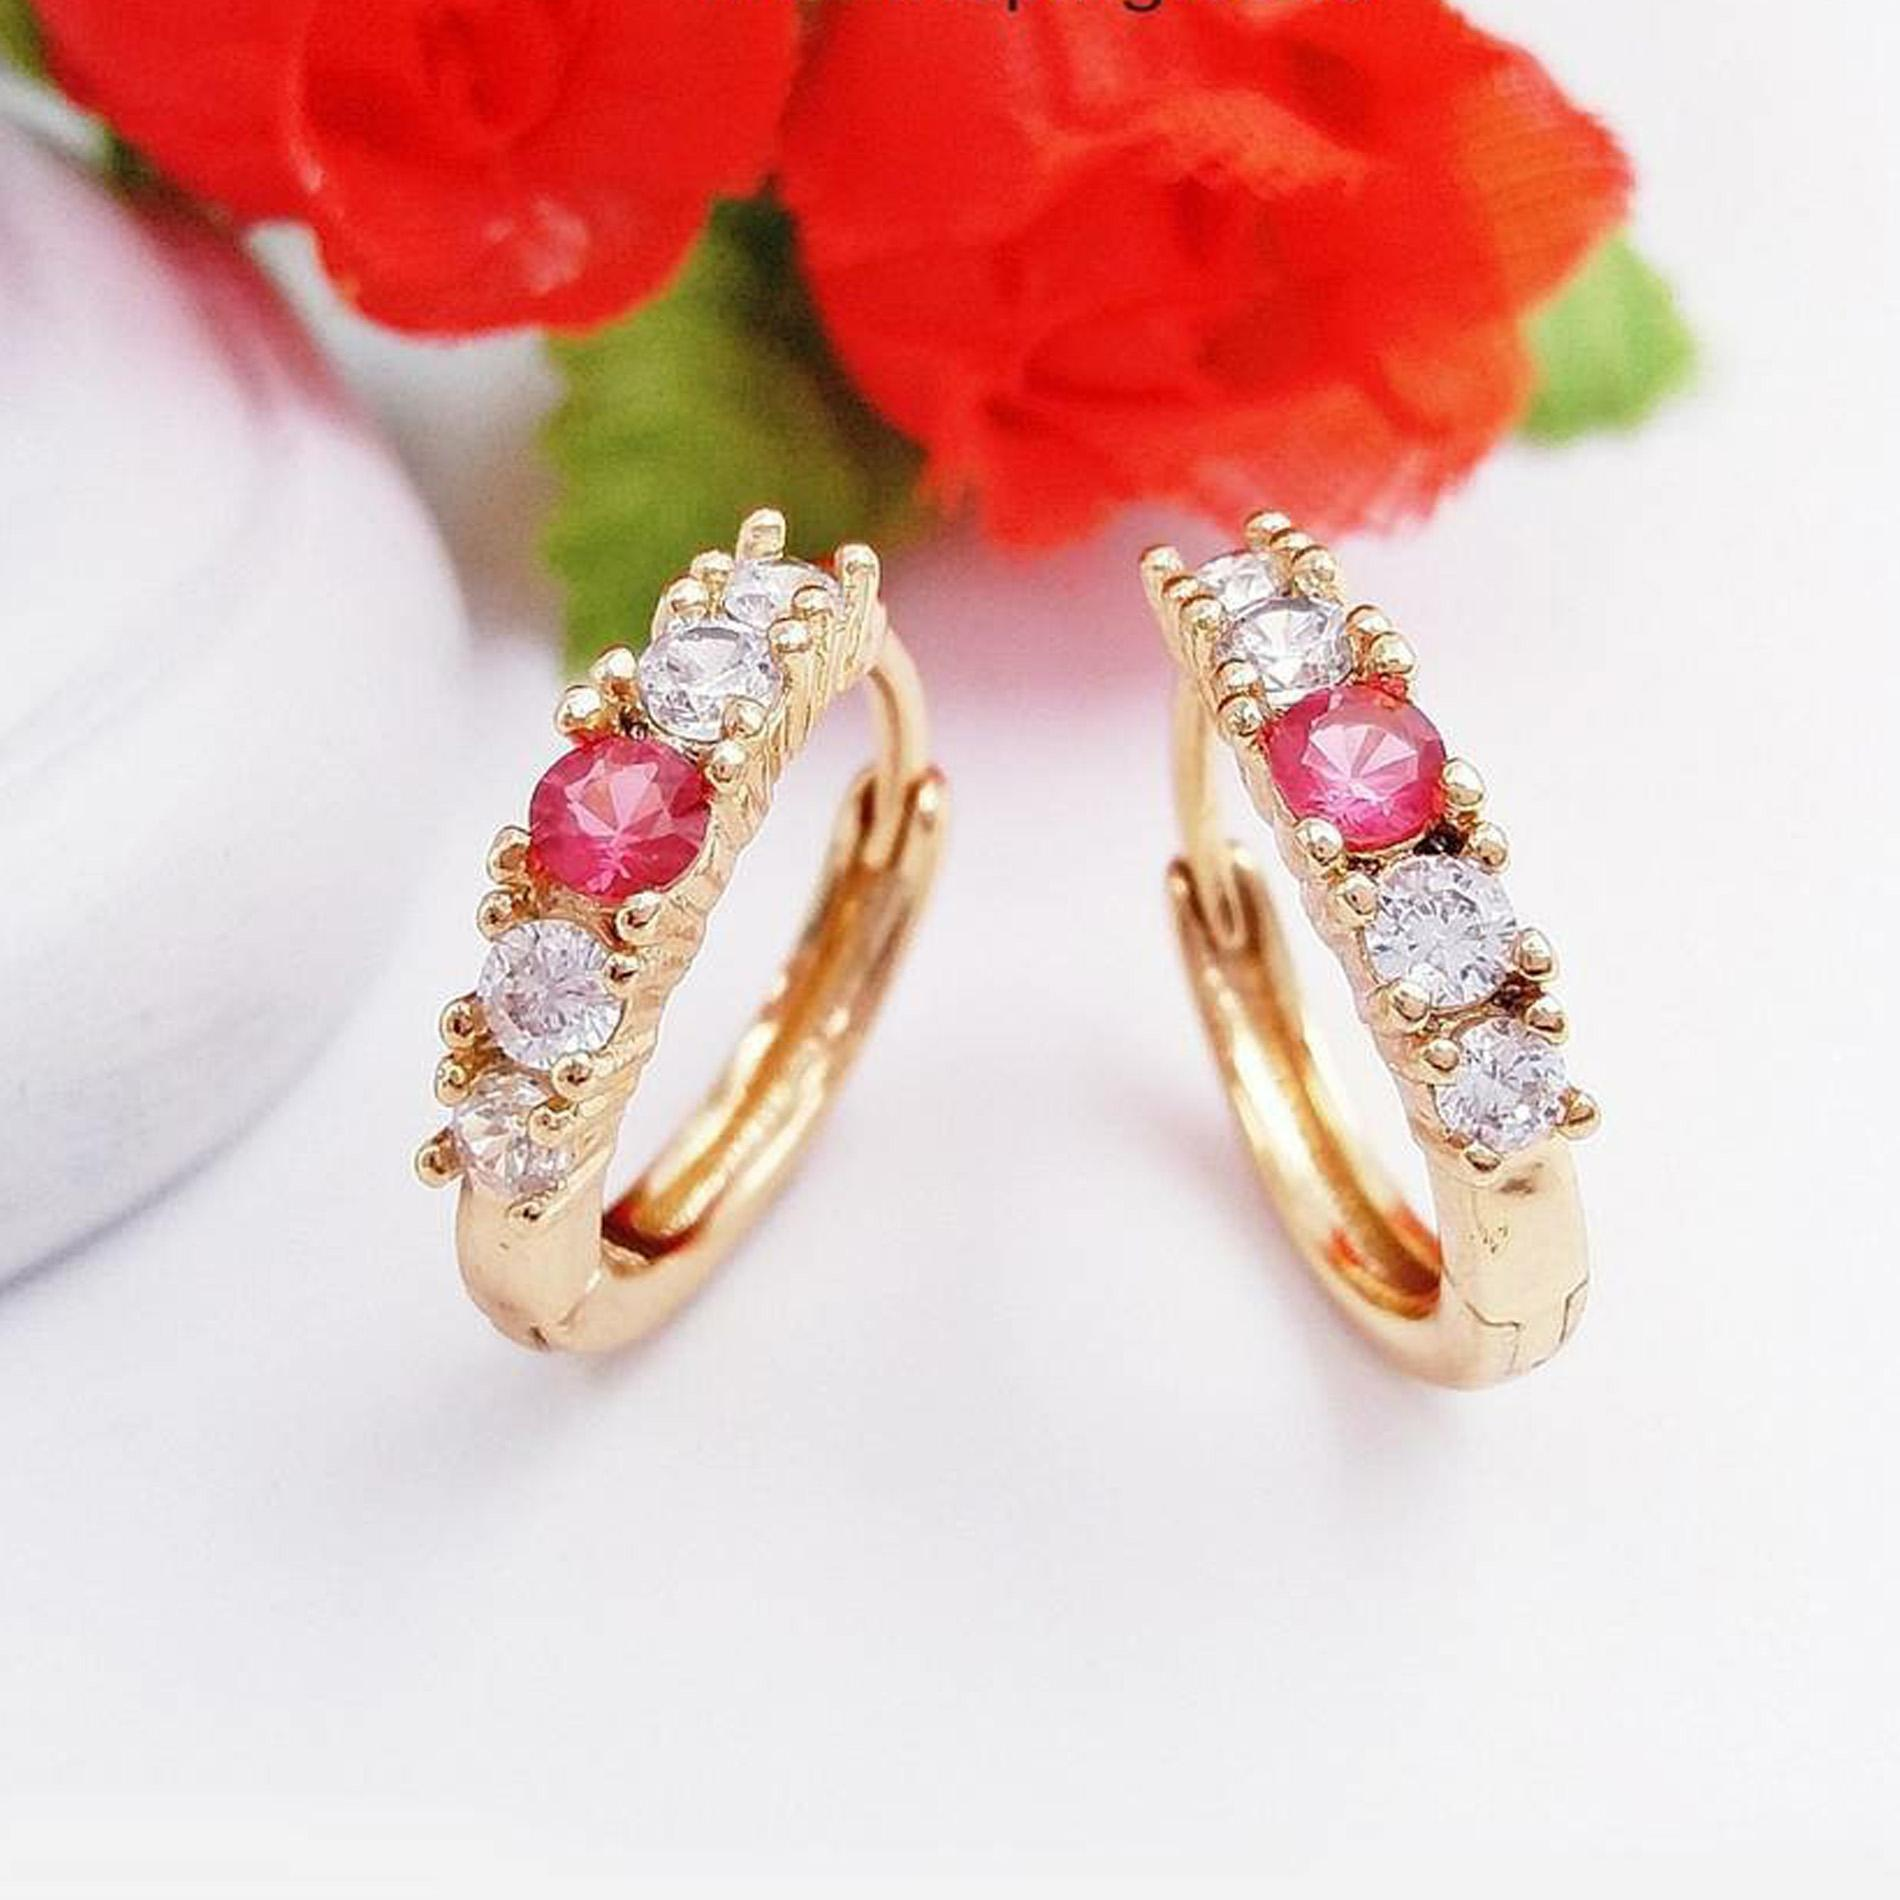 RAKA Acc - Anting Clip Model Merah Putih Xuping Gold Perhiasan Cantik Wanita Lapis Emas 18k